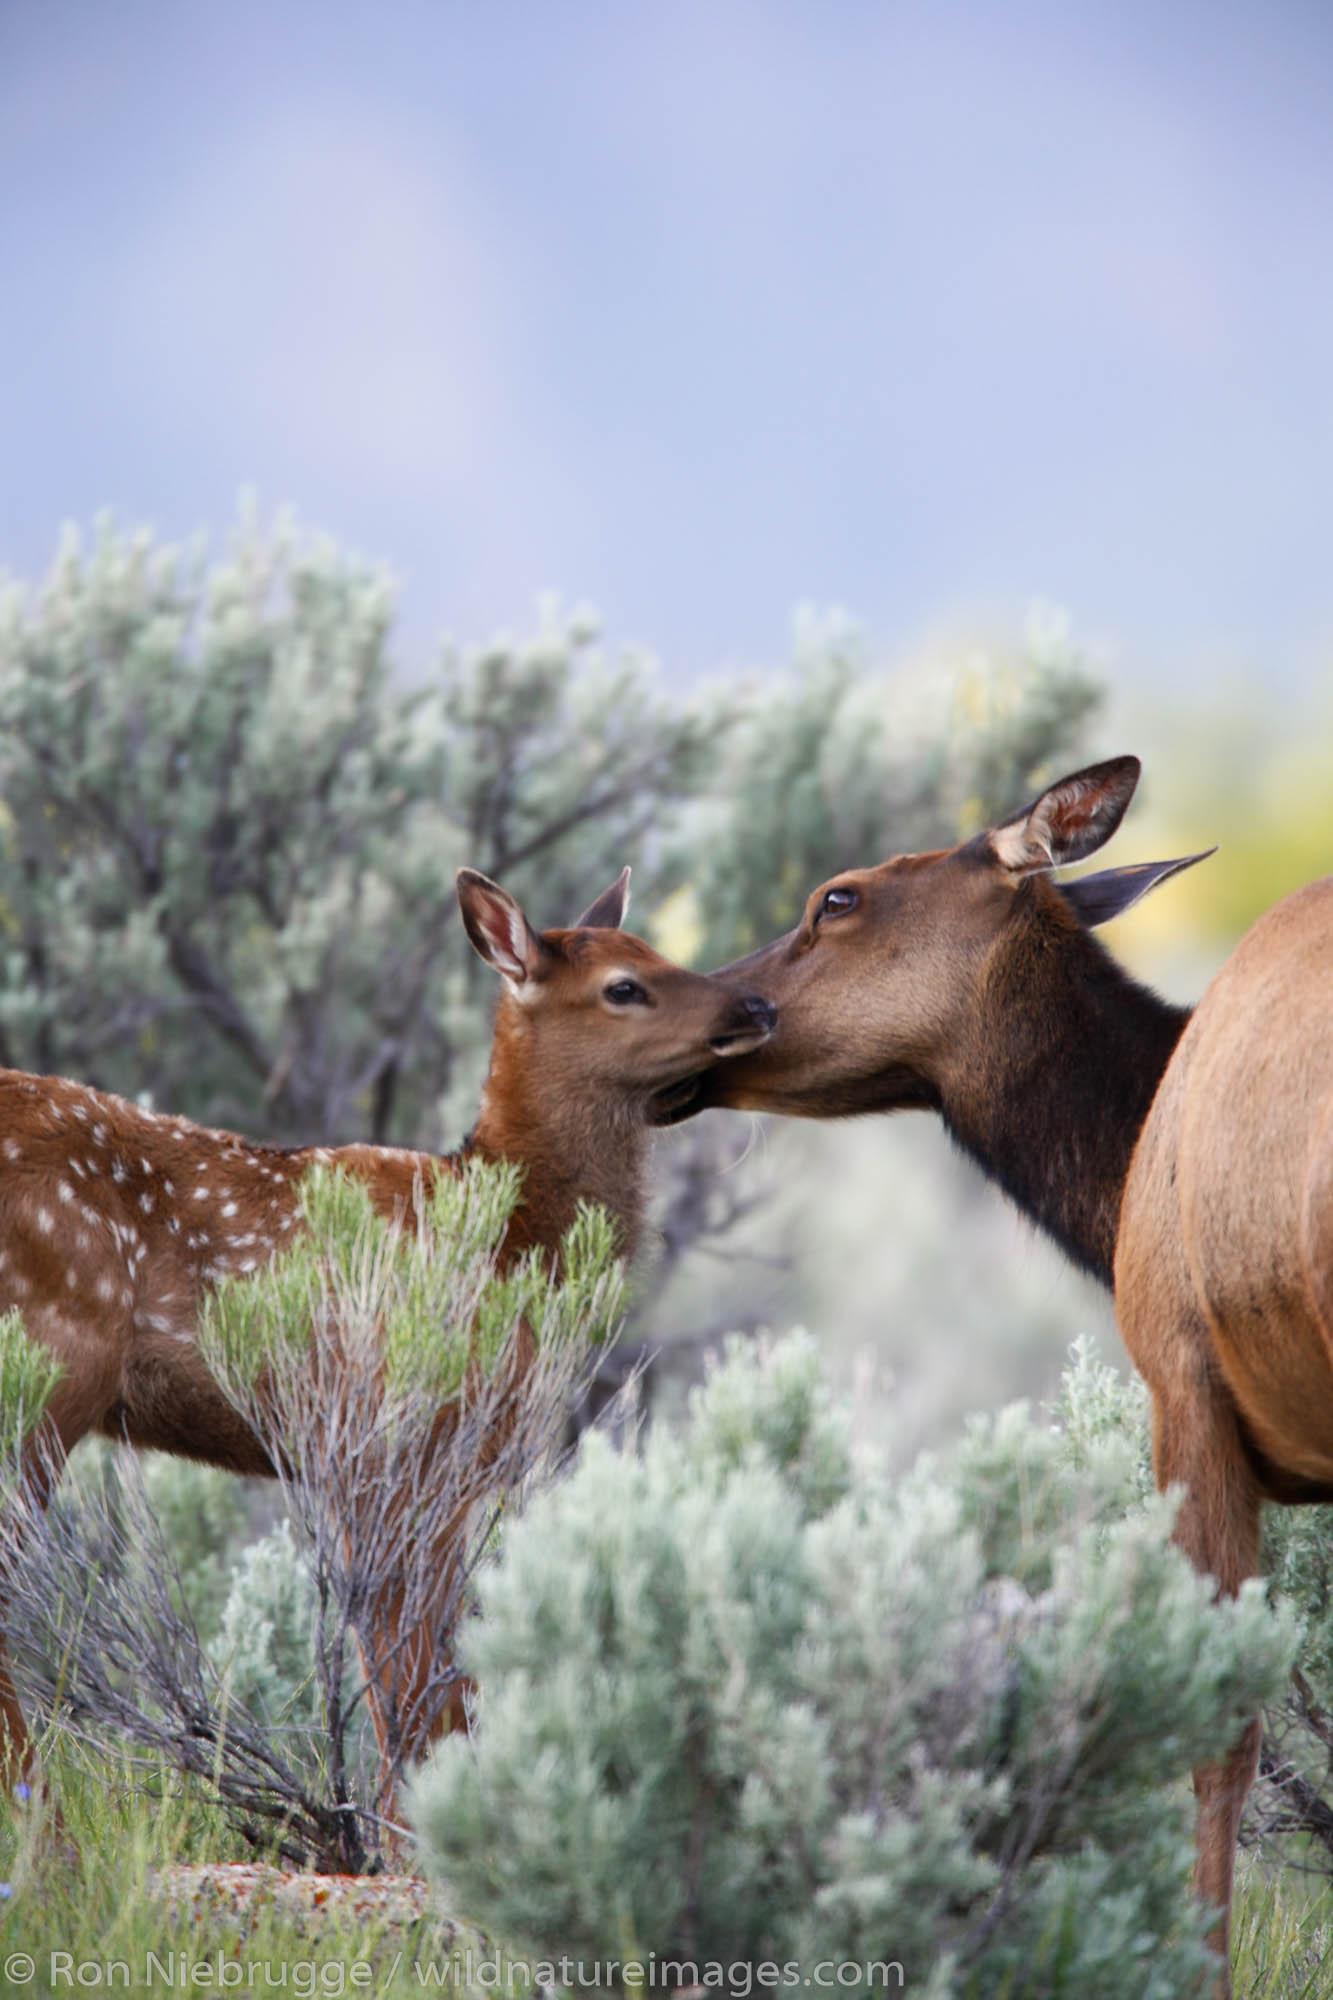 Elk calf in Yellowstone National Park, Wyoming.